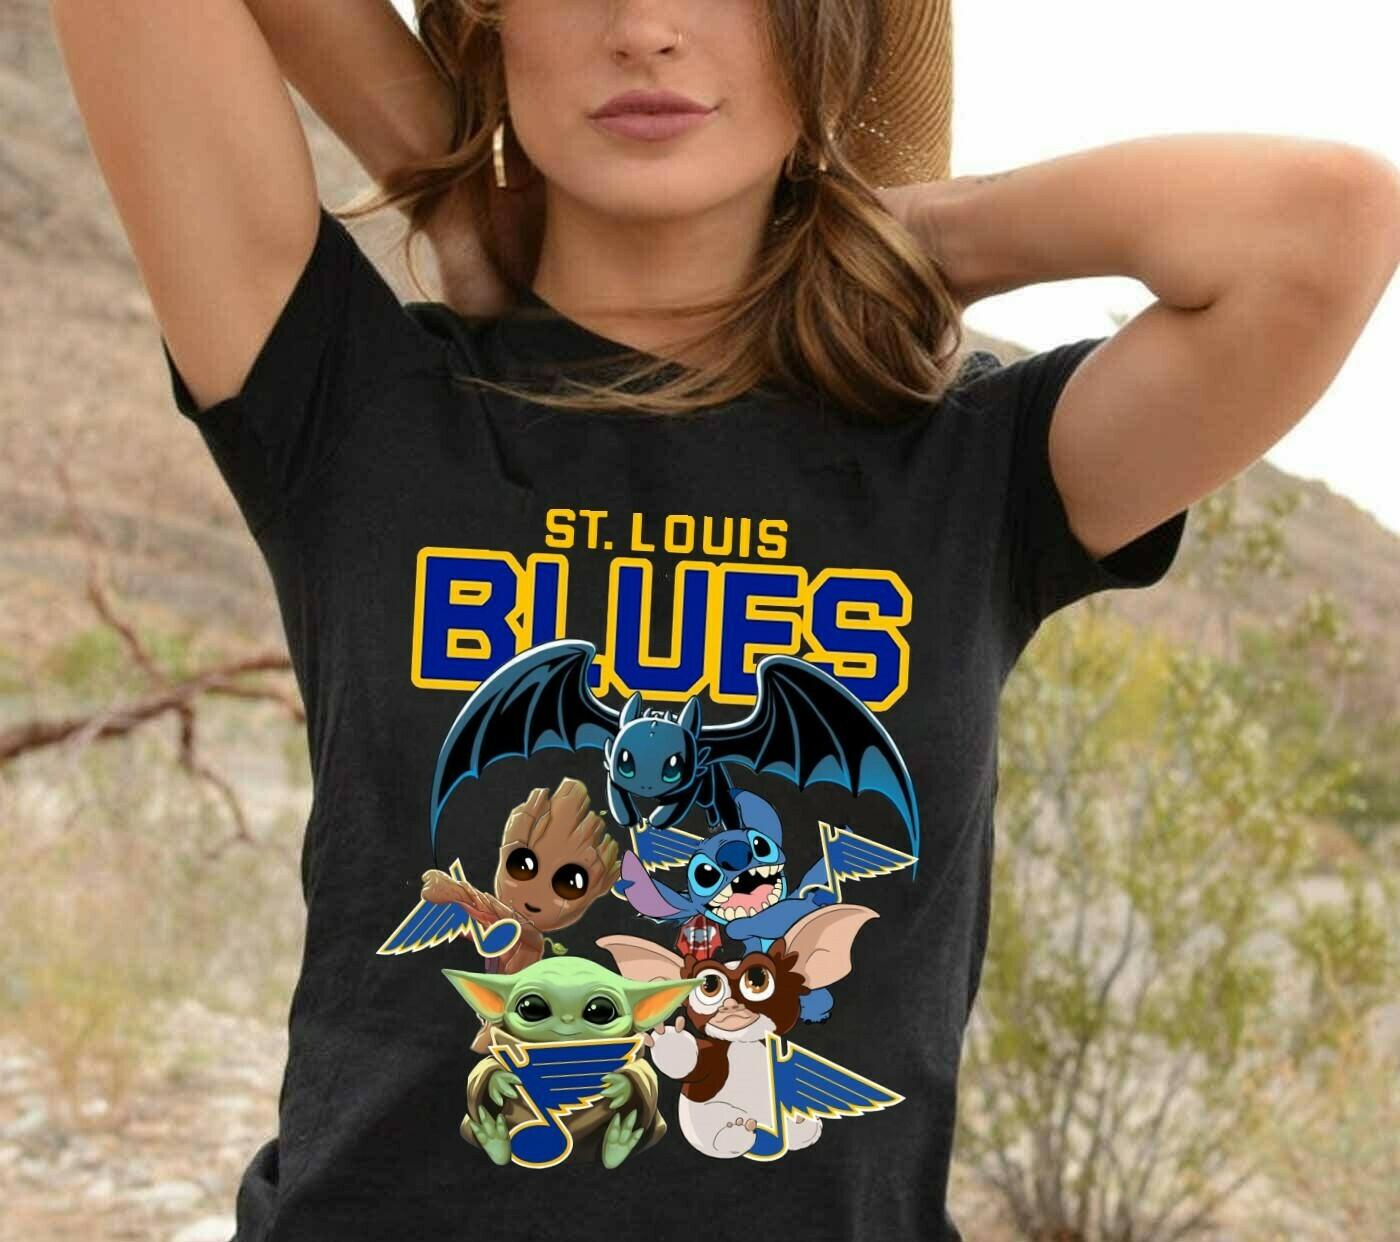 St. Louis Blues Saint Louis Baby Yoda Star Wars The Mandalorian The Child First Memories Floating Baseball Dad Mon Kid Fan Gift T-Shirt Long Sleeve Sweatshirt Hoodie Jolly Family Gifts